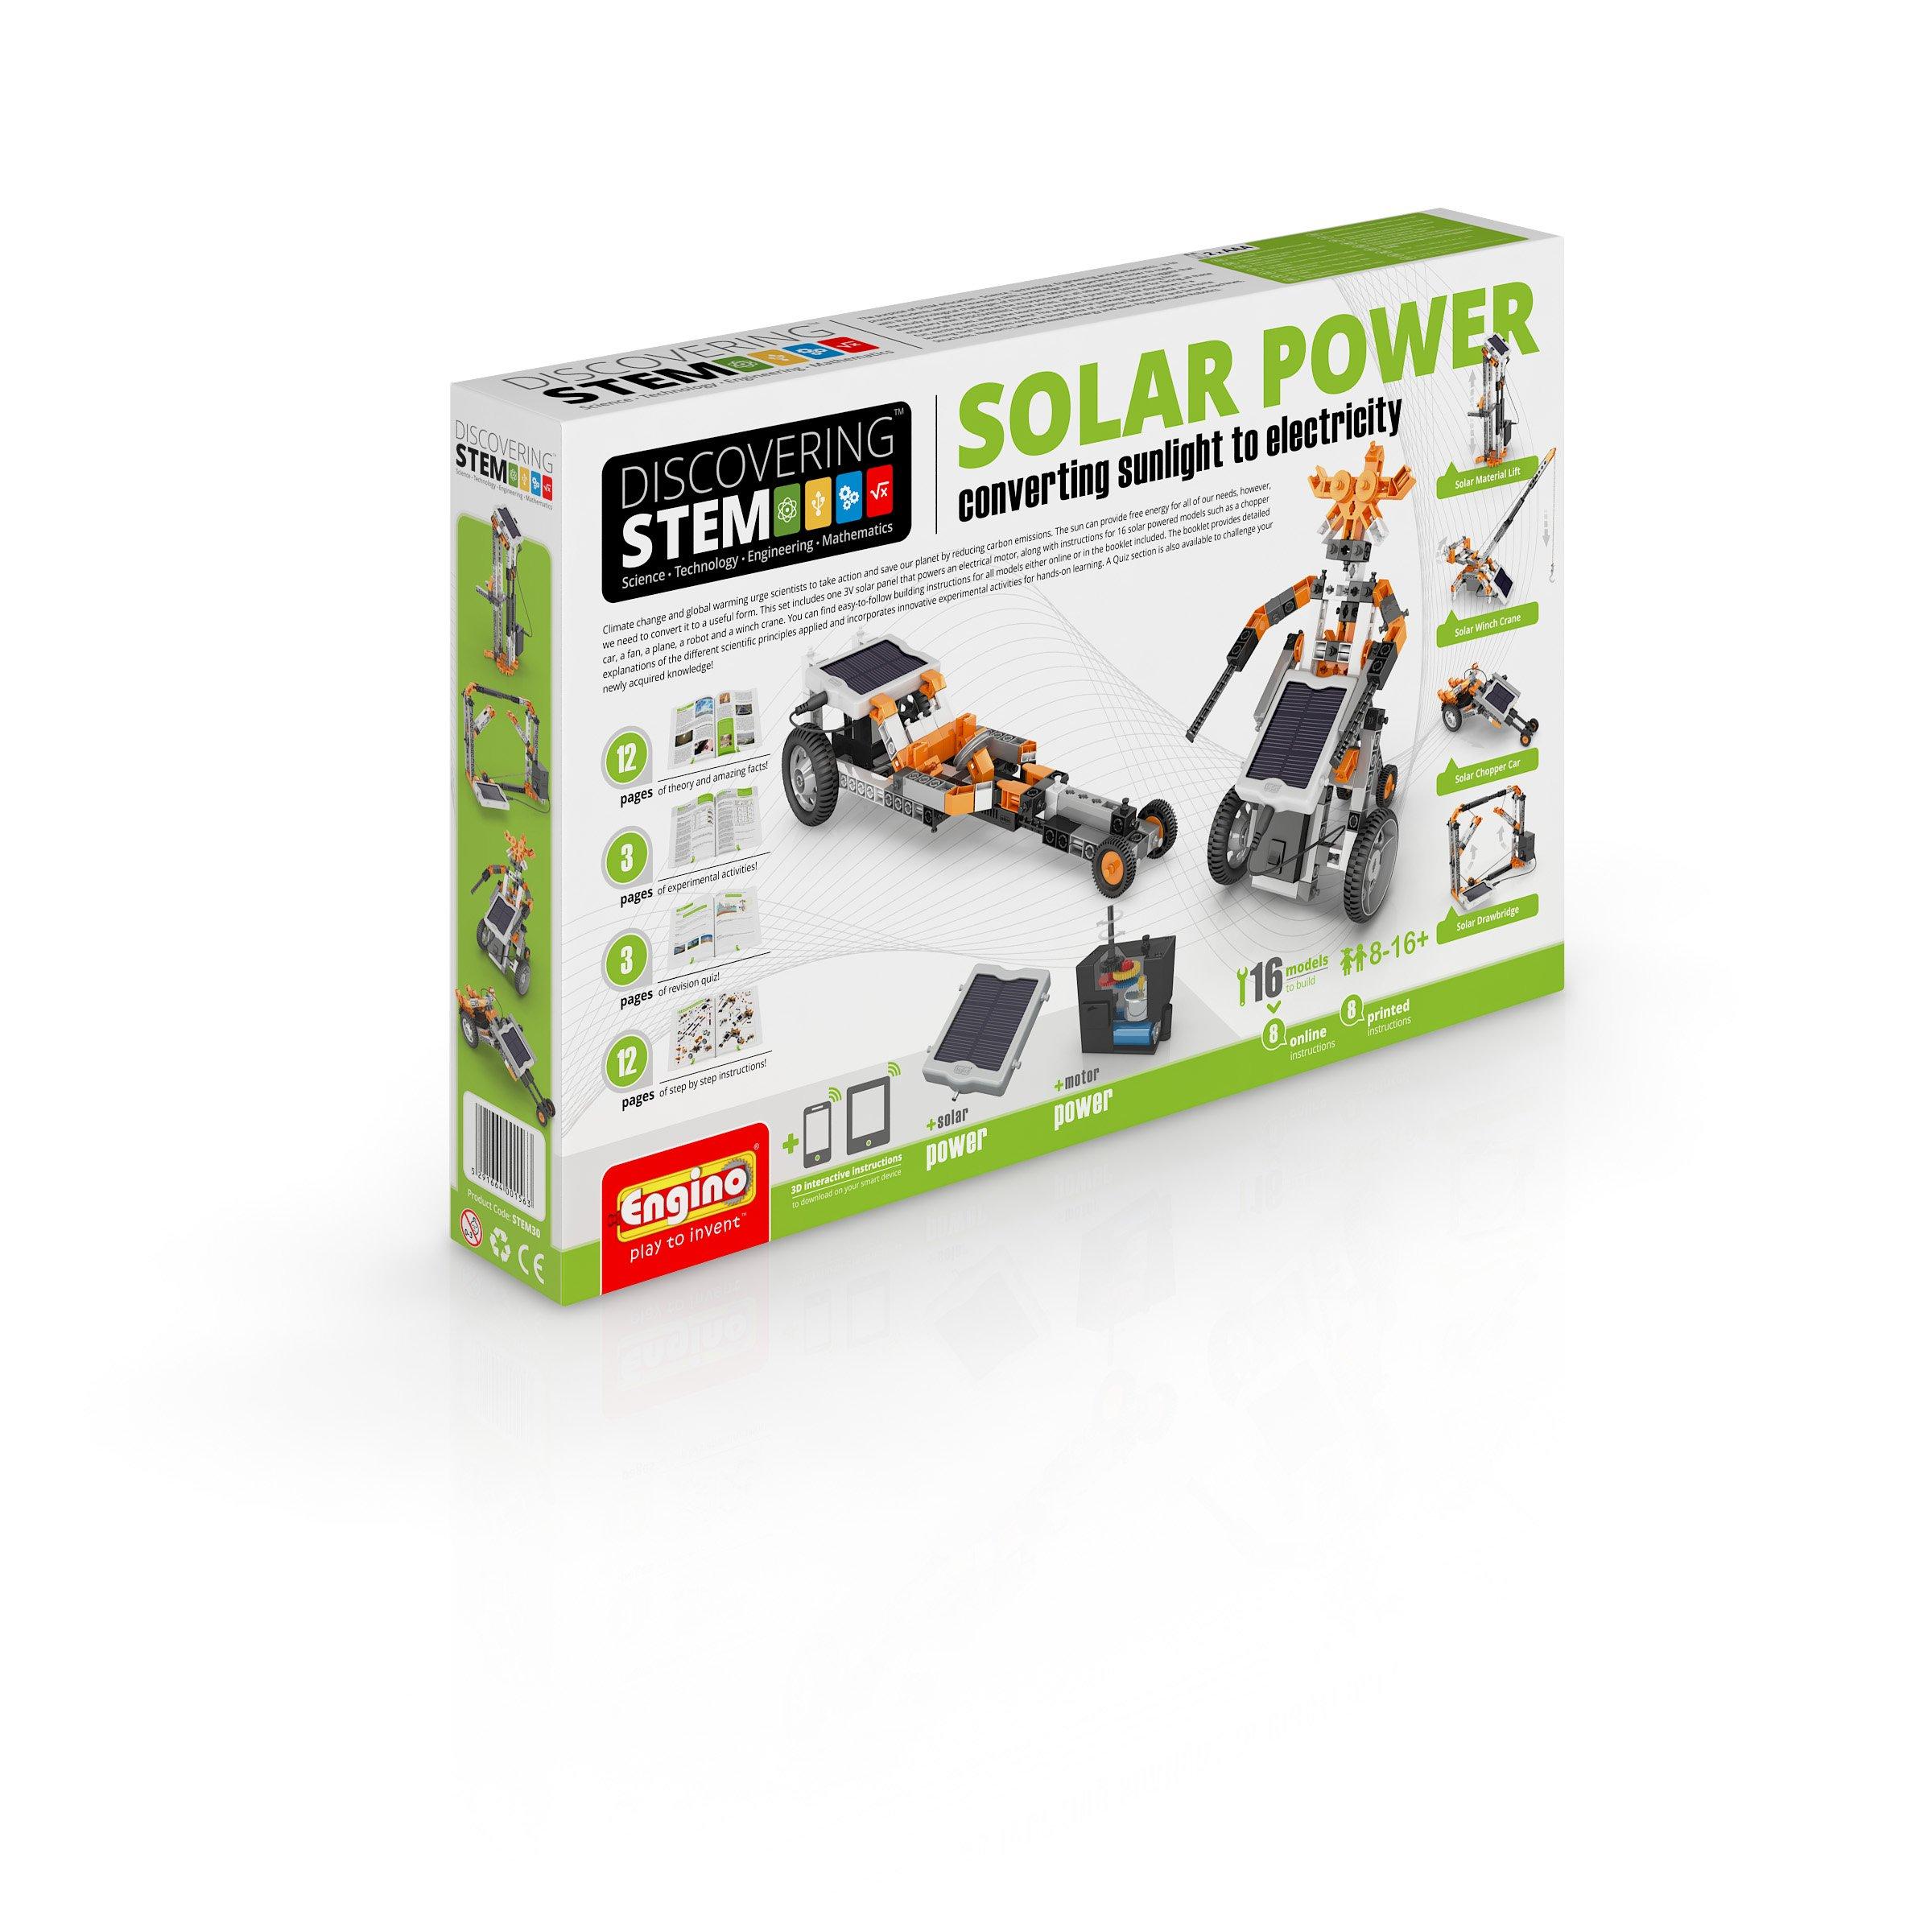 Engino S.T.E.M.  Solar Power Building Model Kit